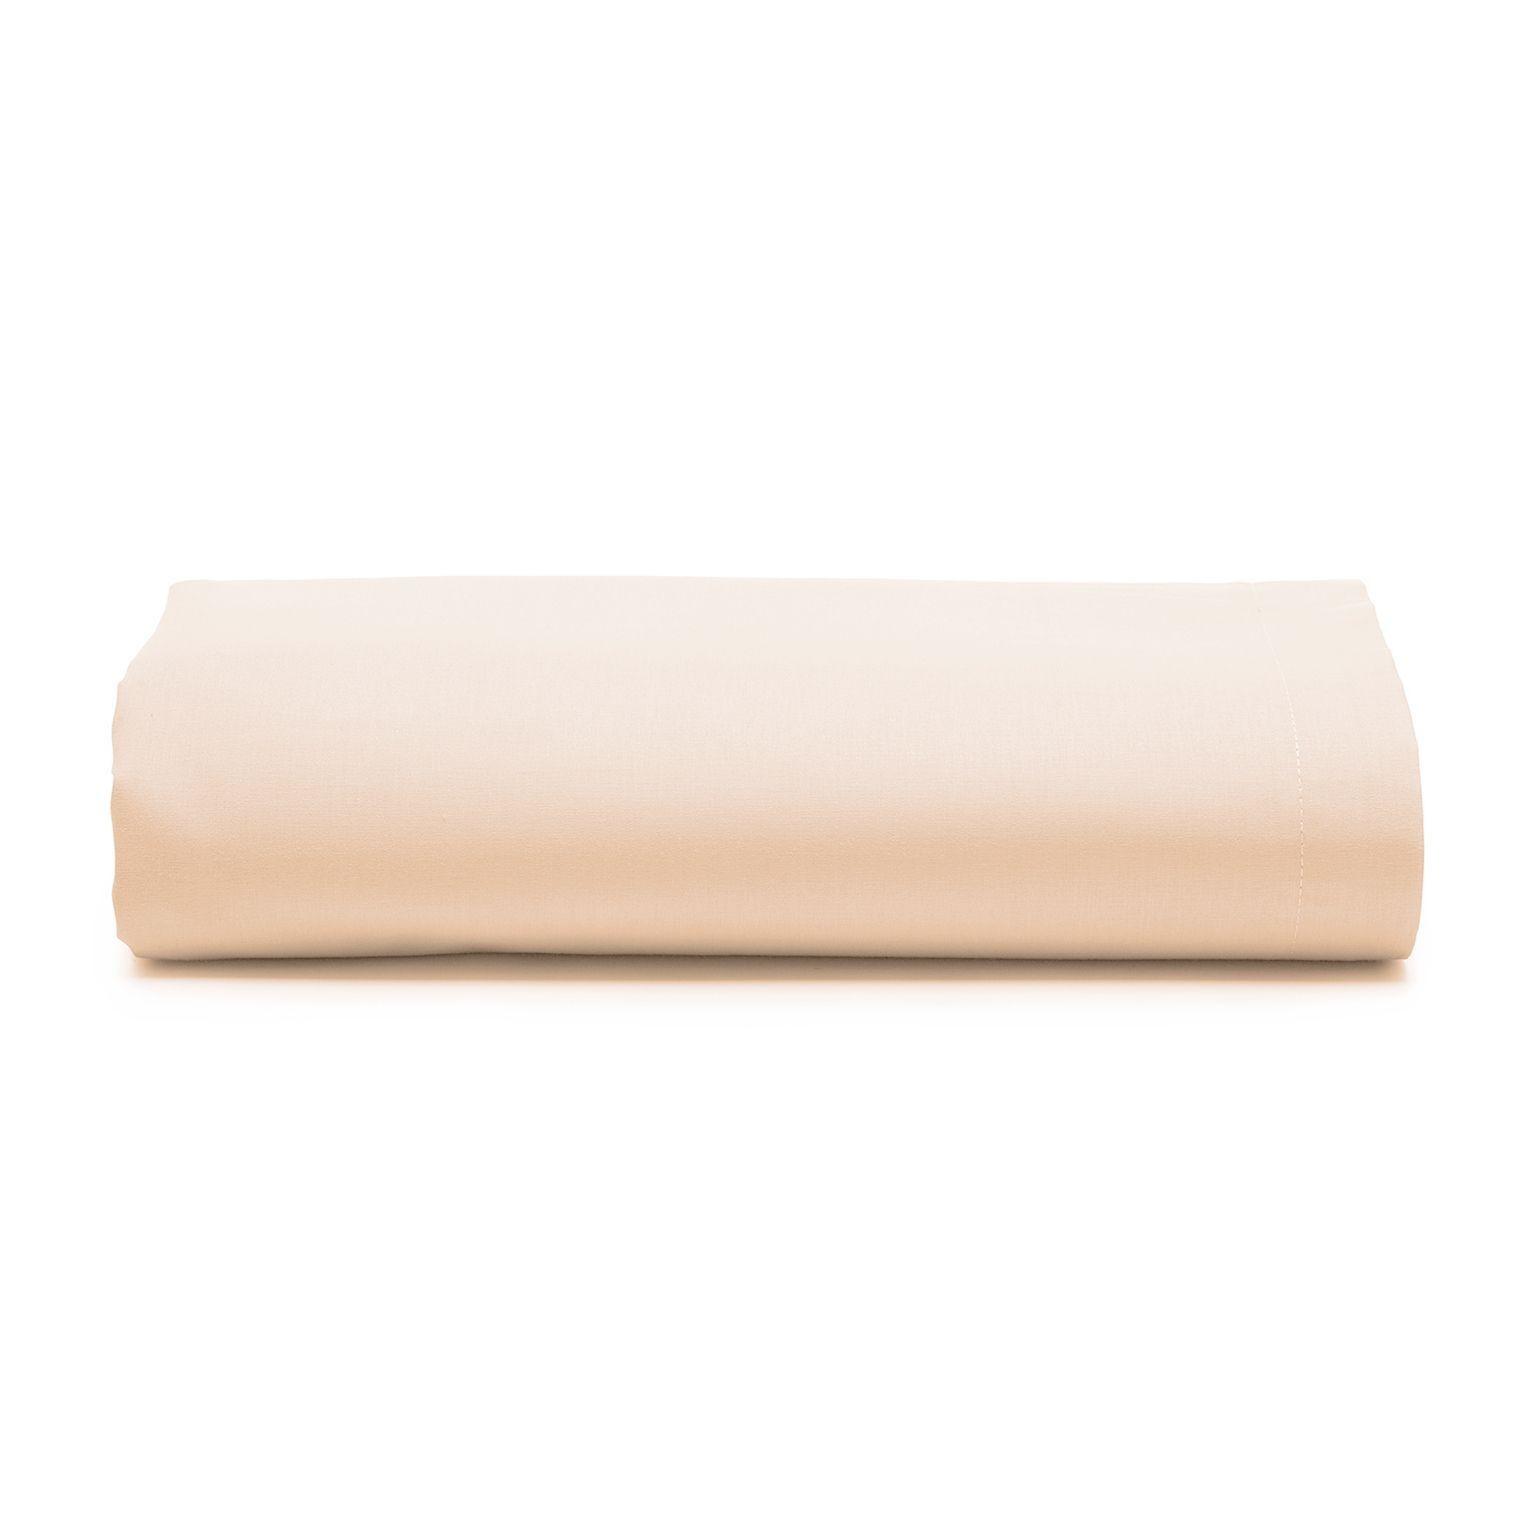 Lencol Casal Prata sem Elastico 100 Algodao Bege - Santista